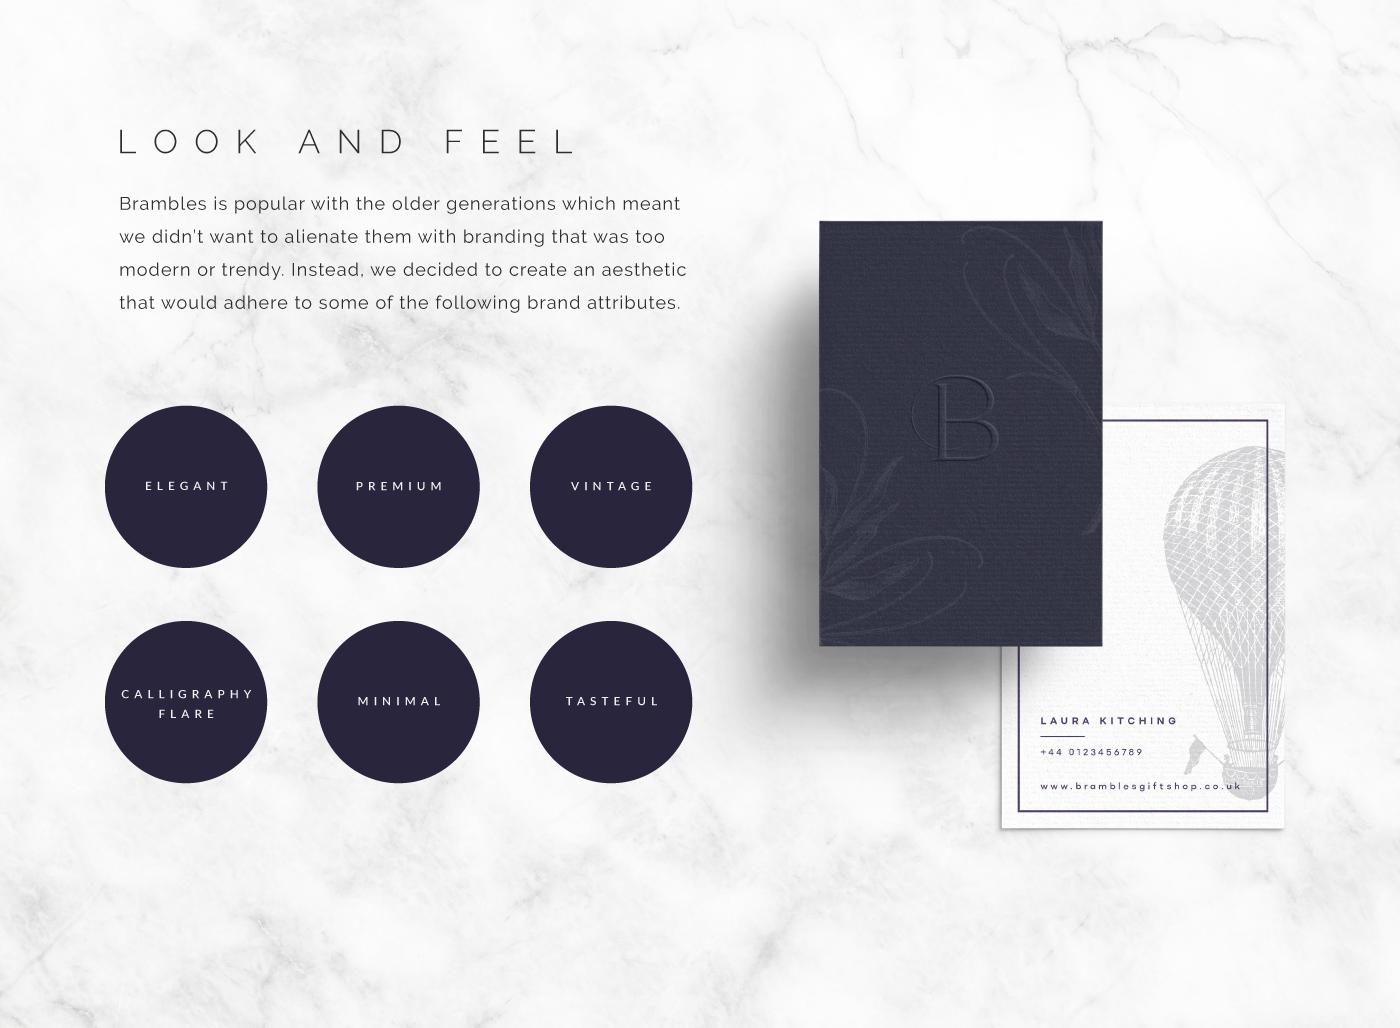 artisan brand brand identity branding  elegant graphic design  Identity Design ILLUSTRATION  Logo Design Packaging